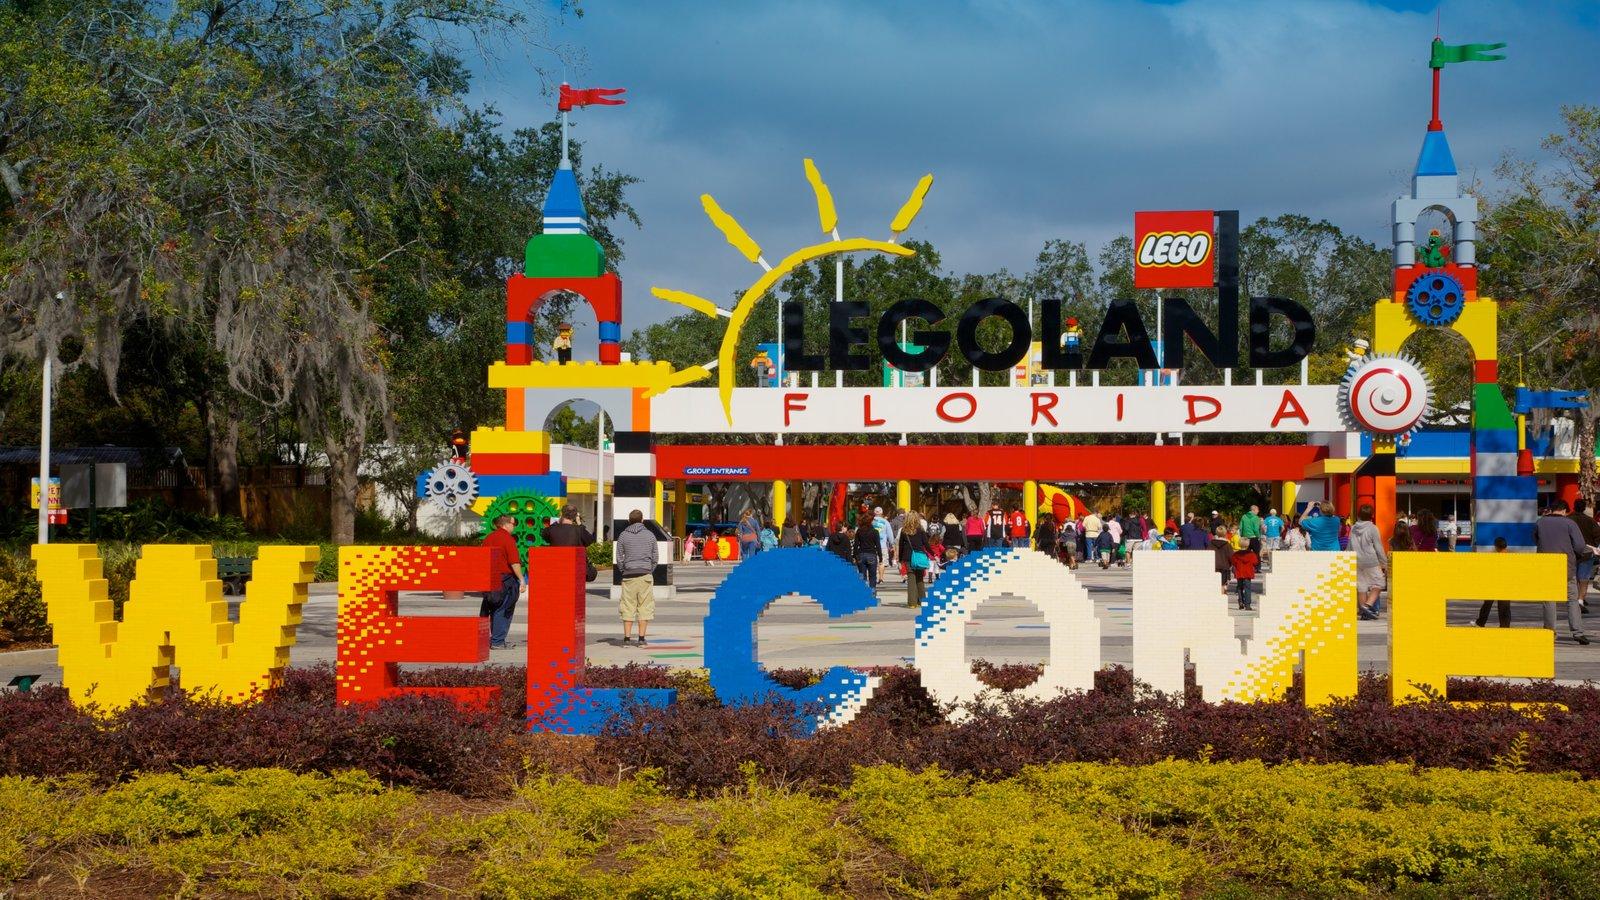 Legoland Florida featuring a park, rides and signage